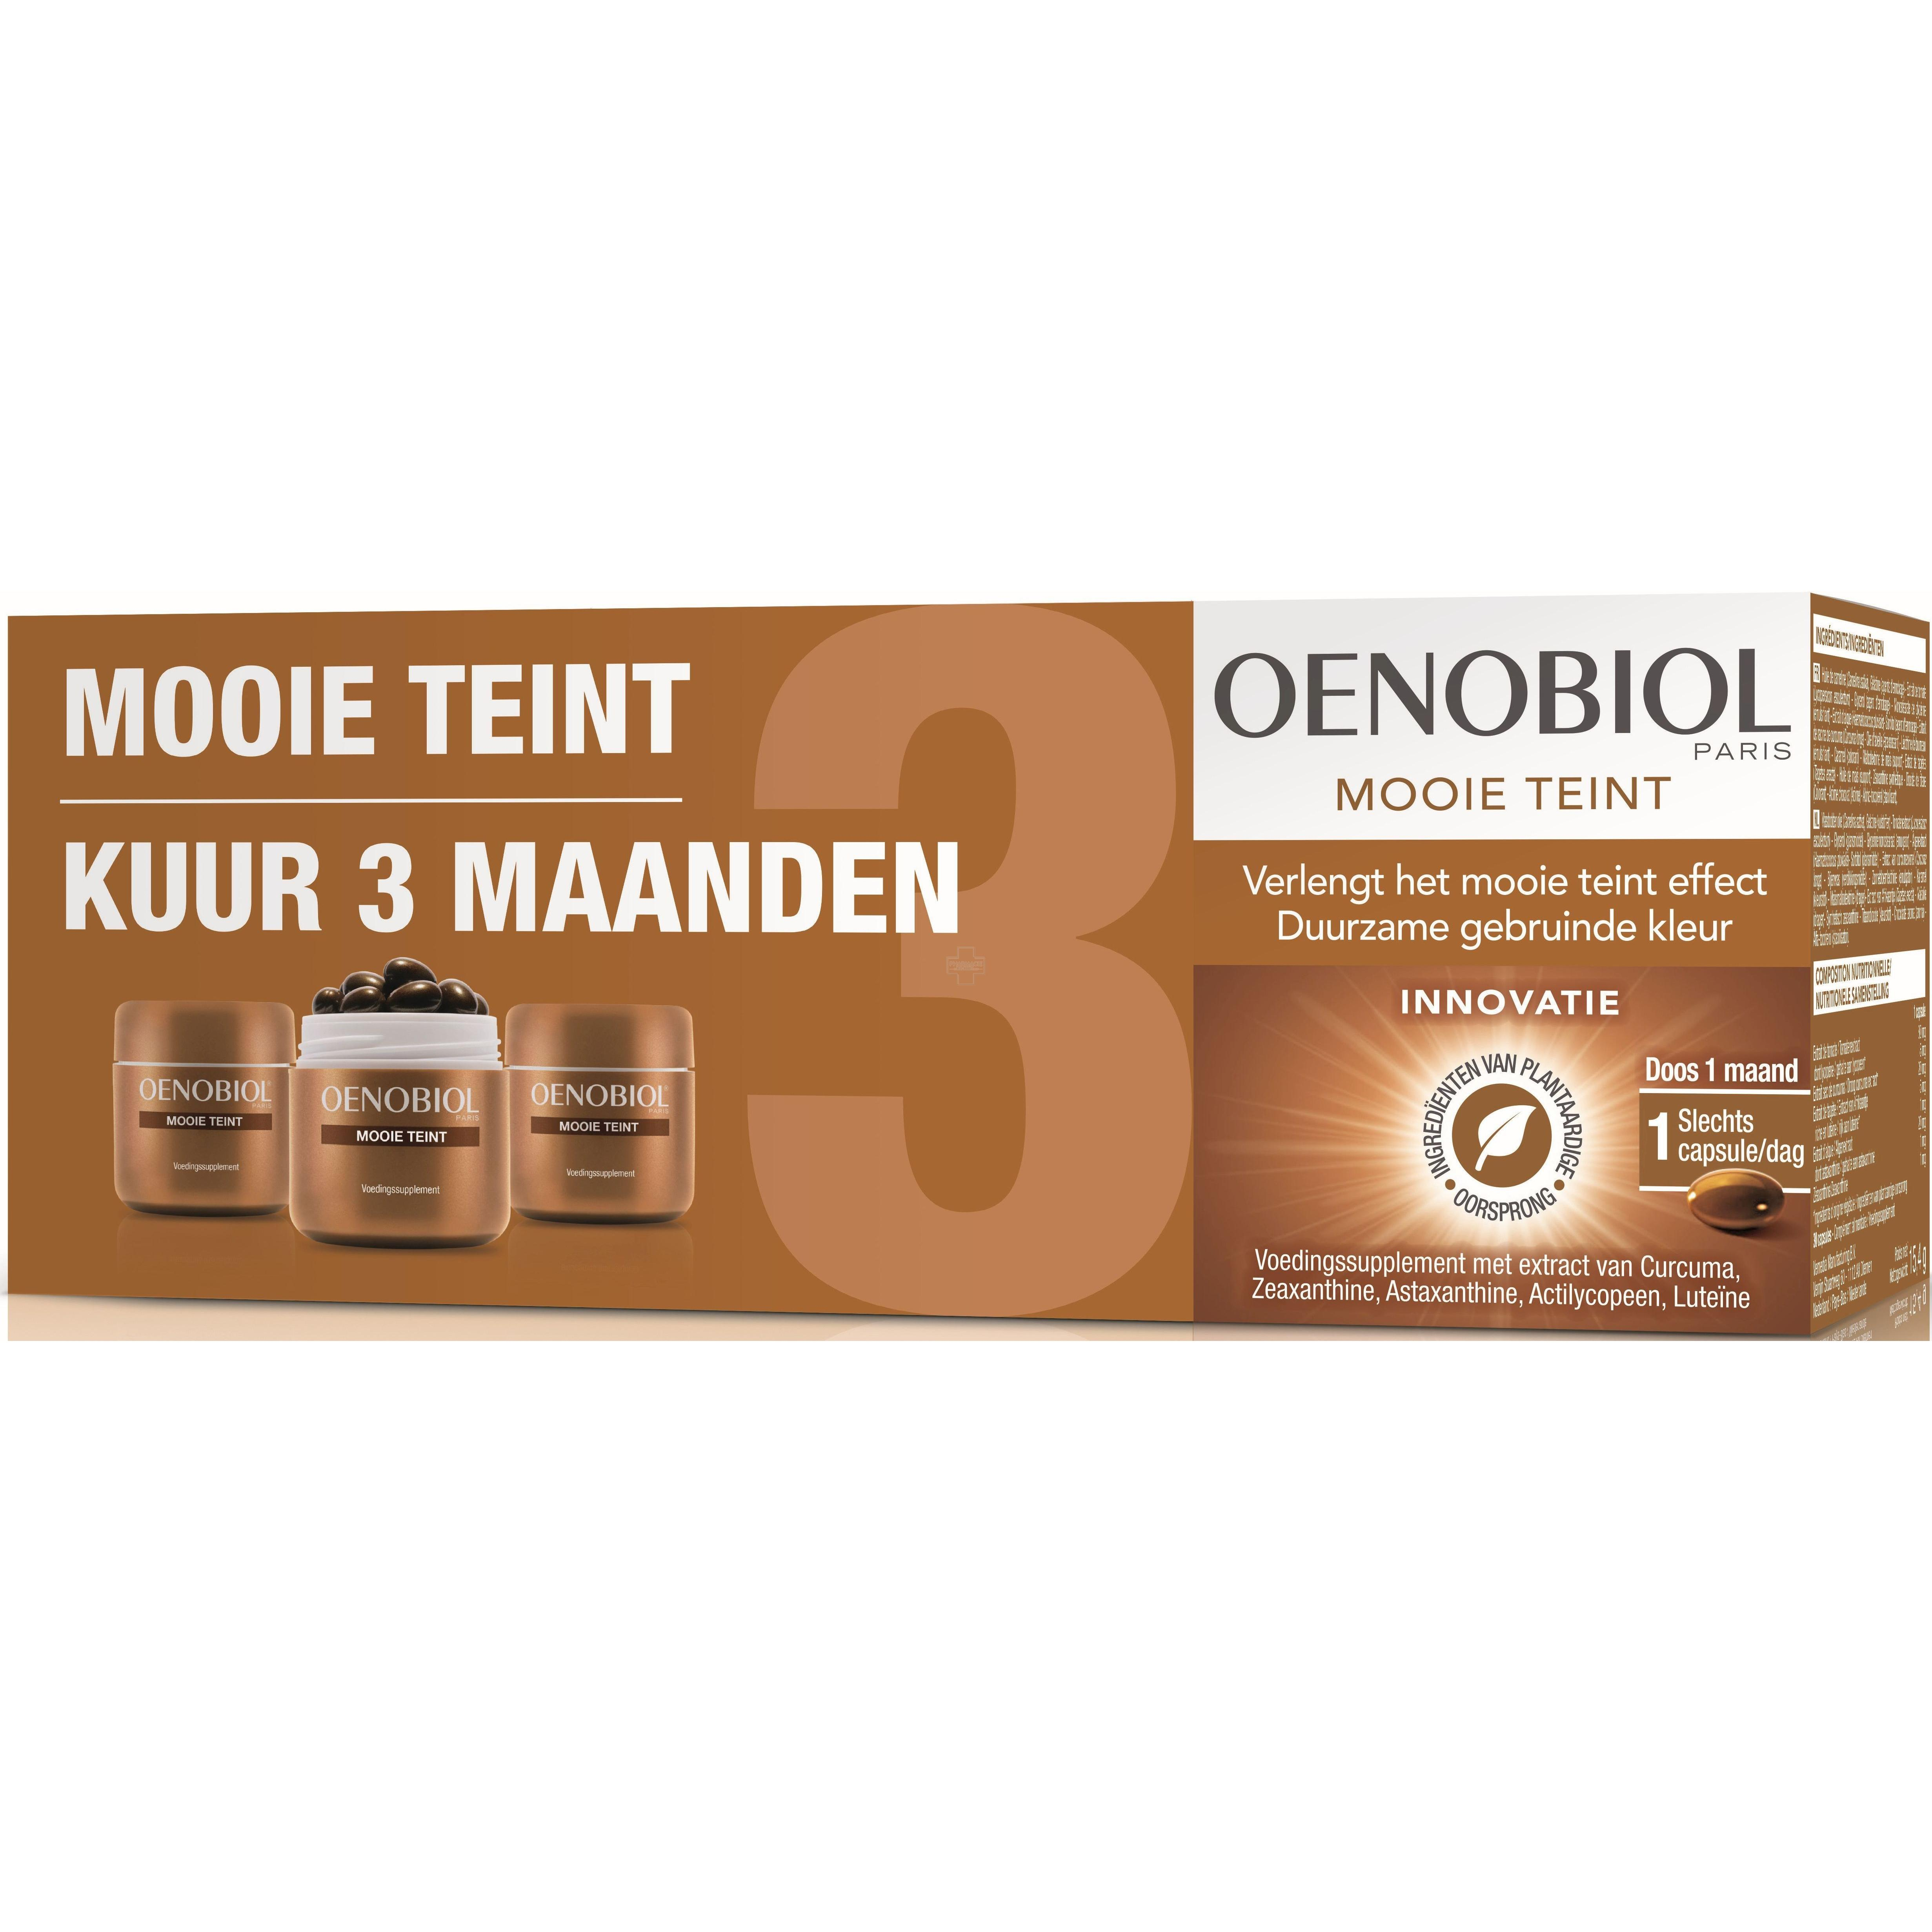 Oenobiol Joli Teint NF Promo